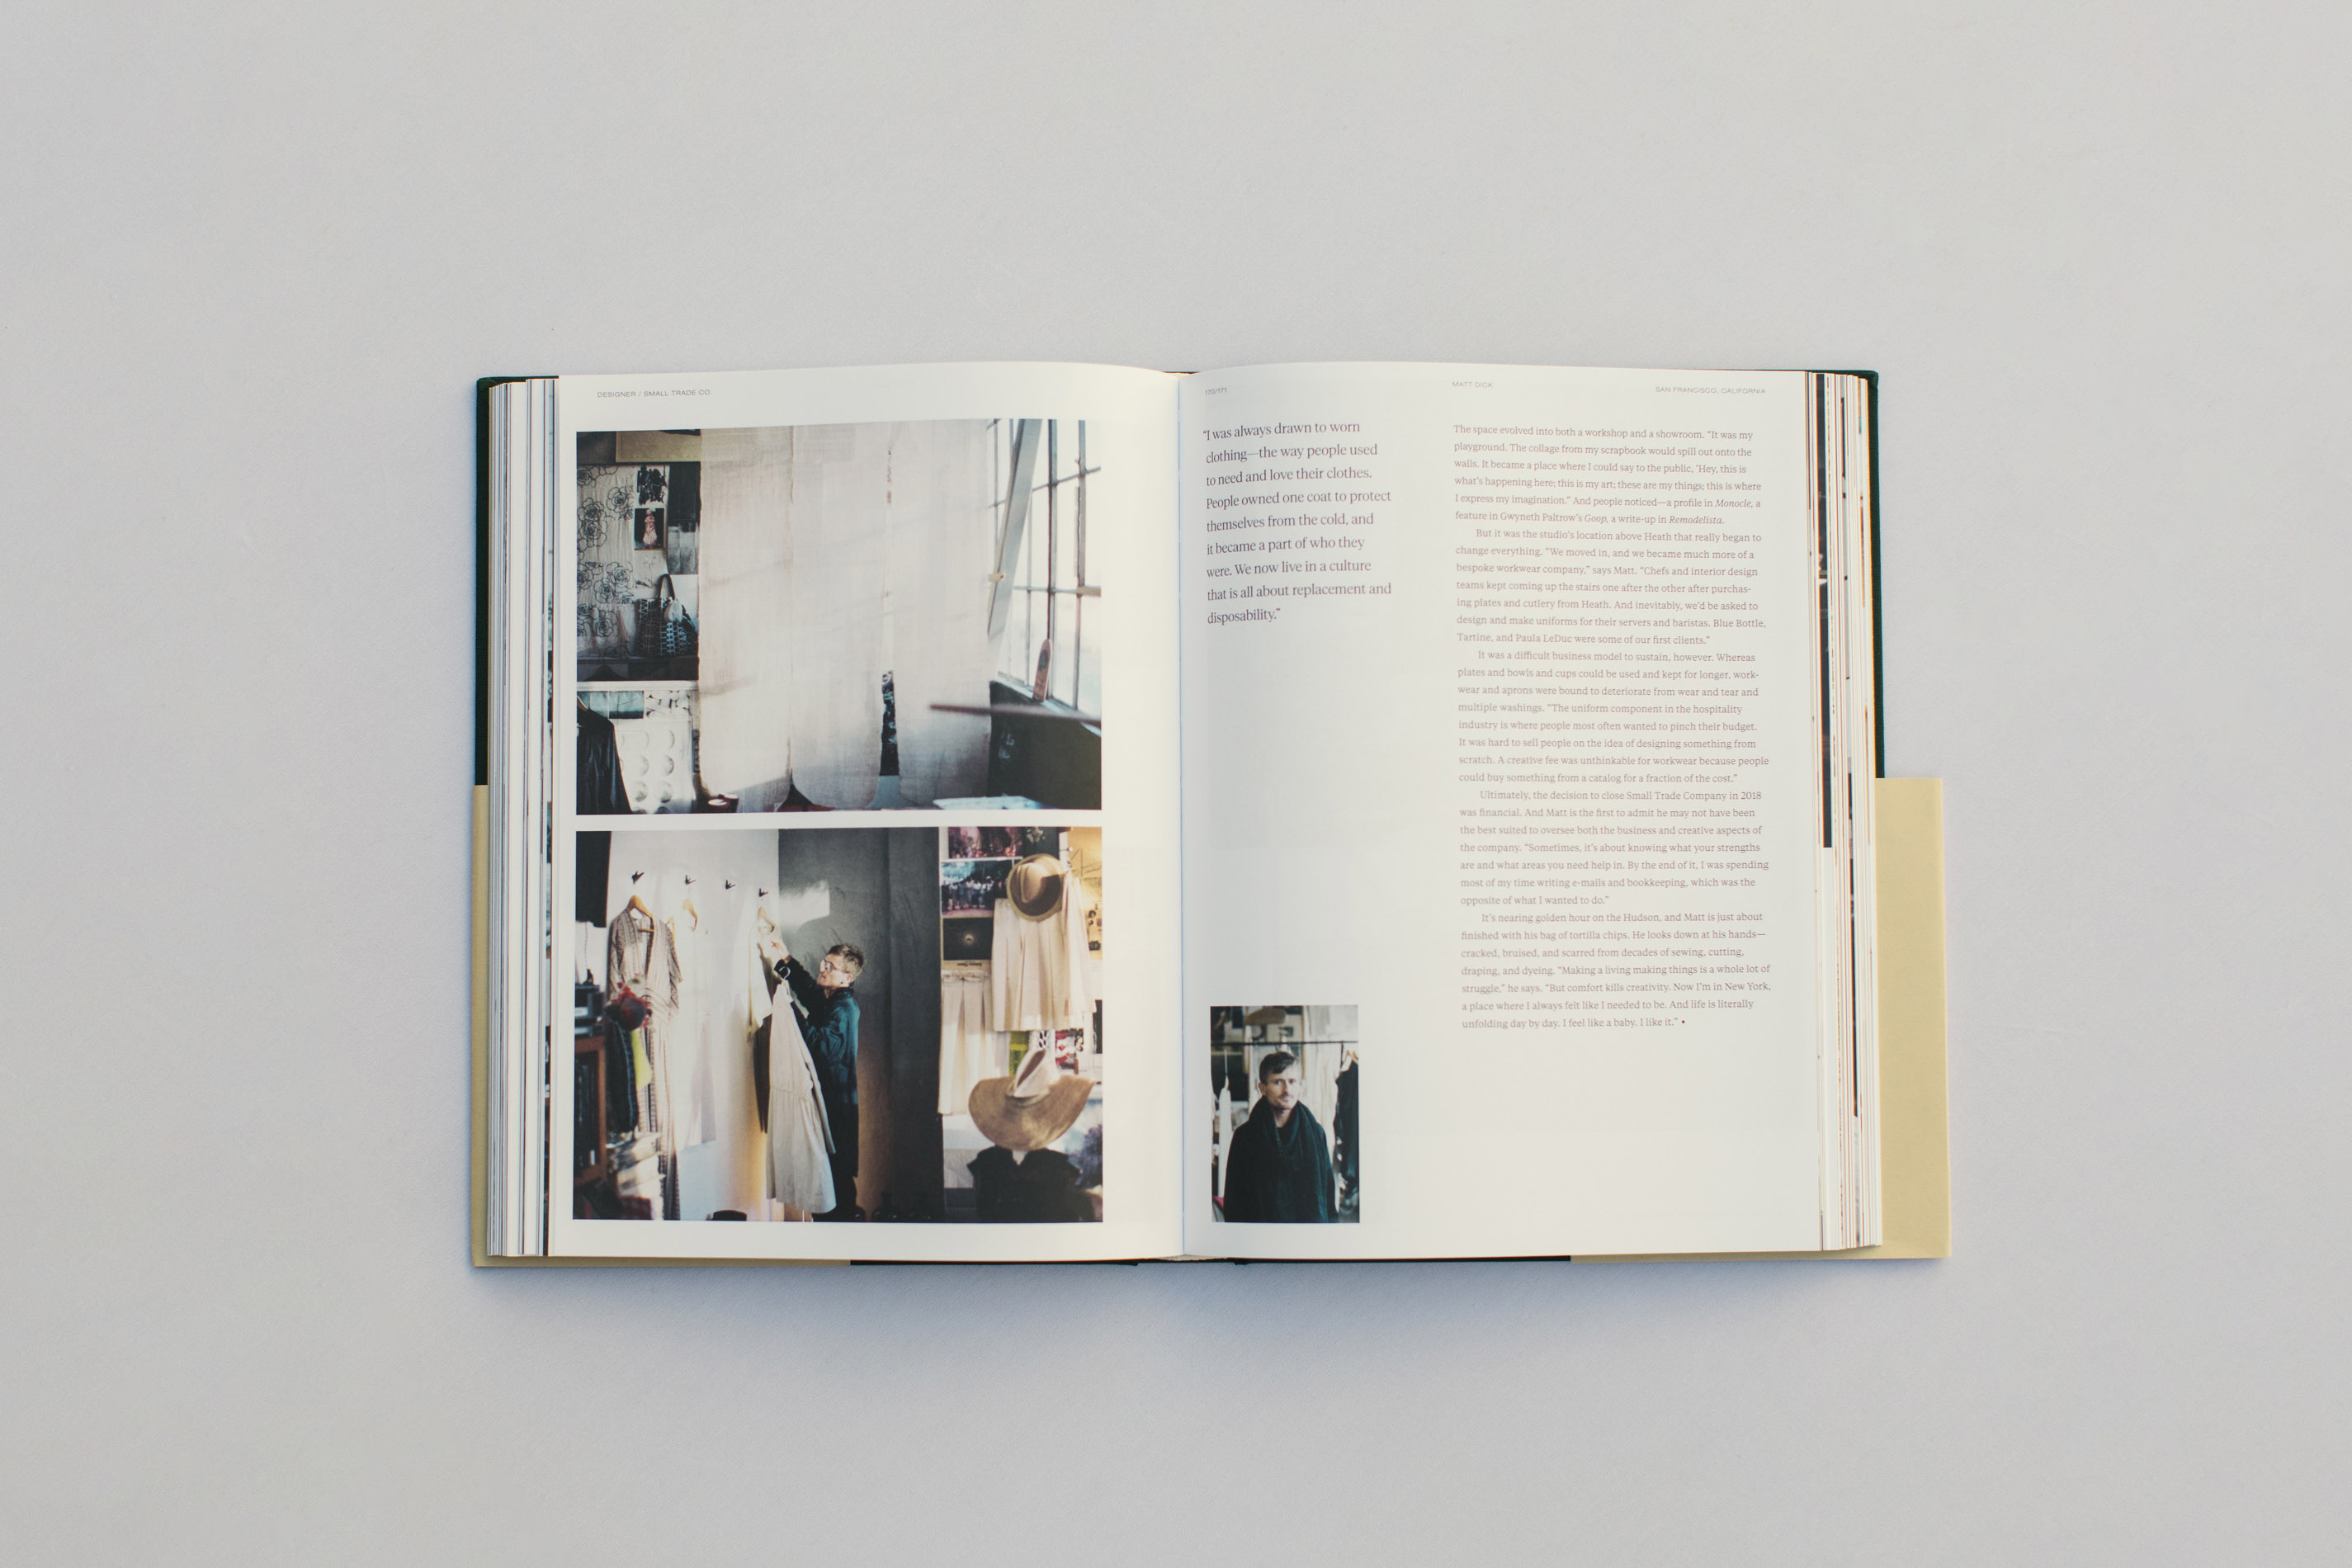 Faculty Department Volume Two, Faculty Department, Justin Chung, Book, Kodak, Matt Dick, Small Trade Company, San Francisco, California